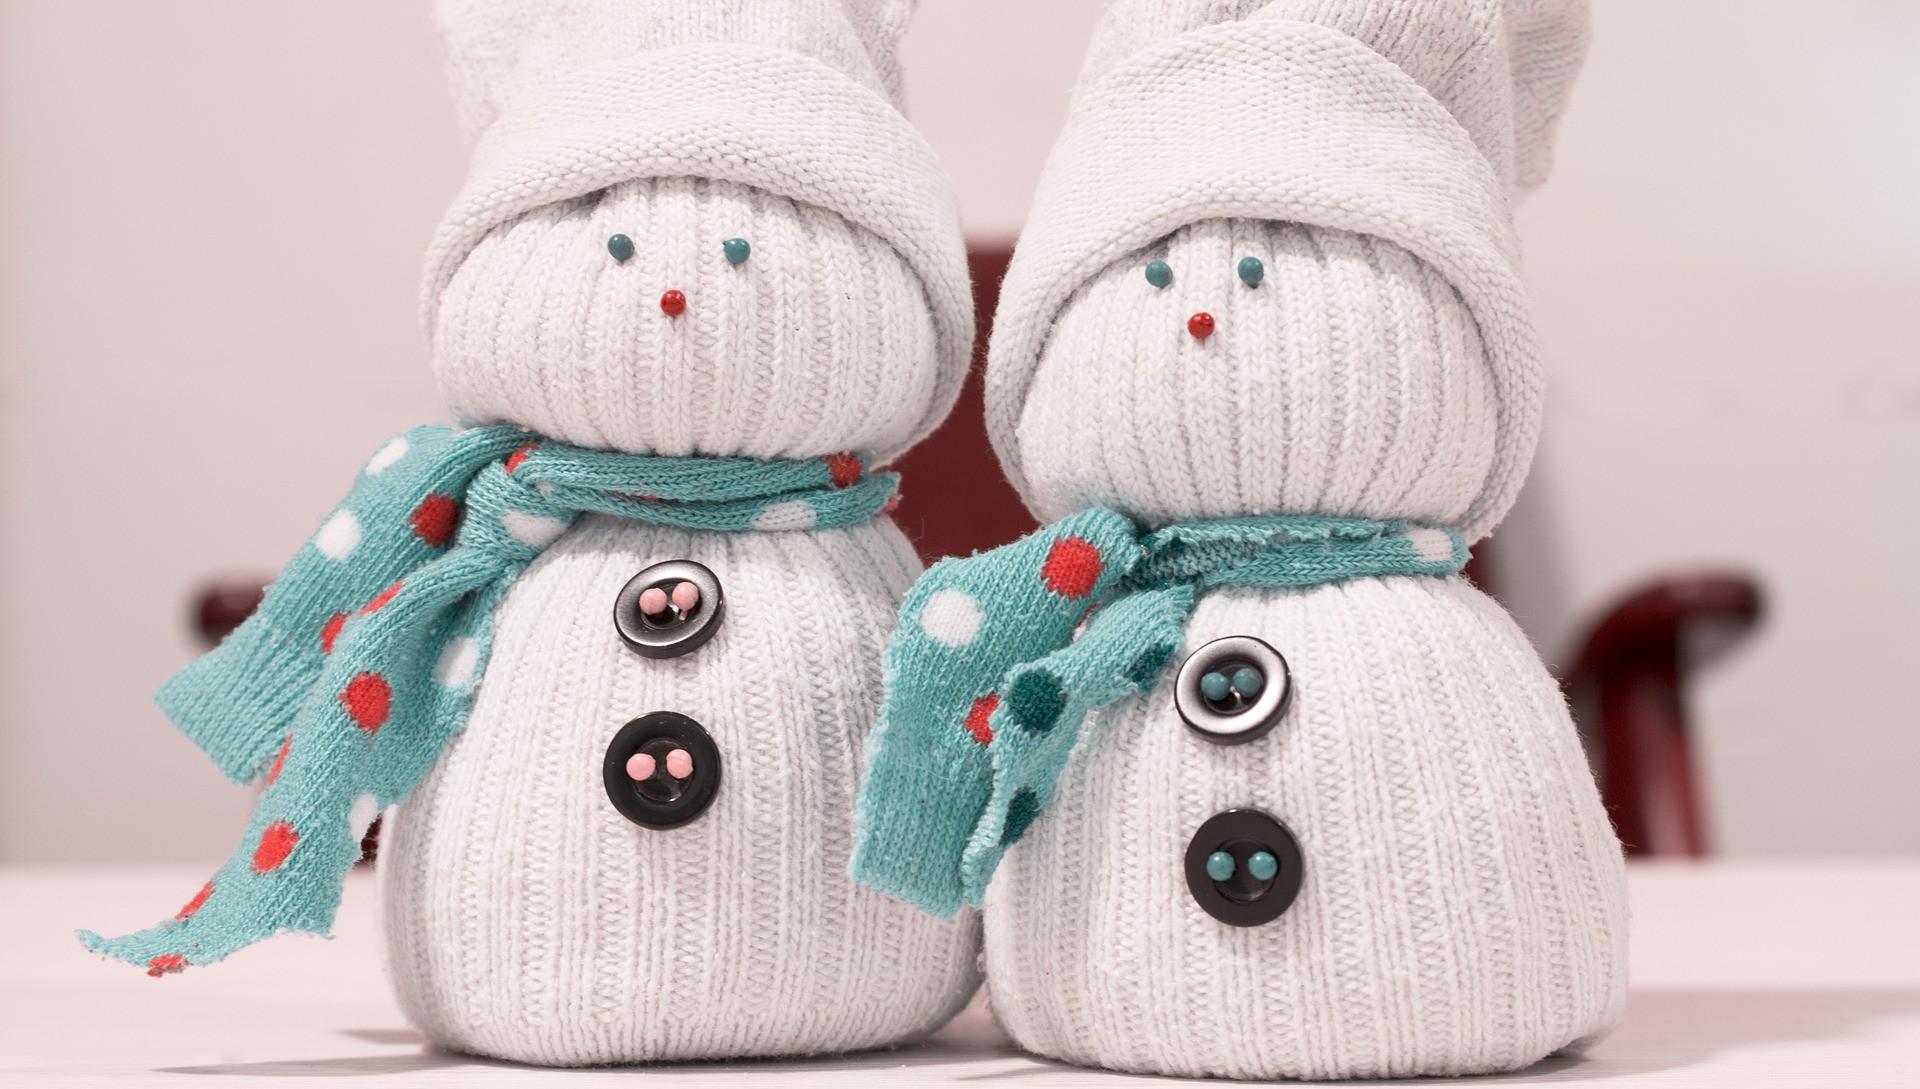 snowman 1083209_1920 e1479466708664